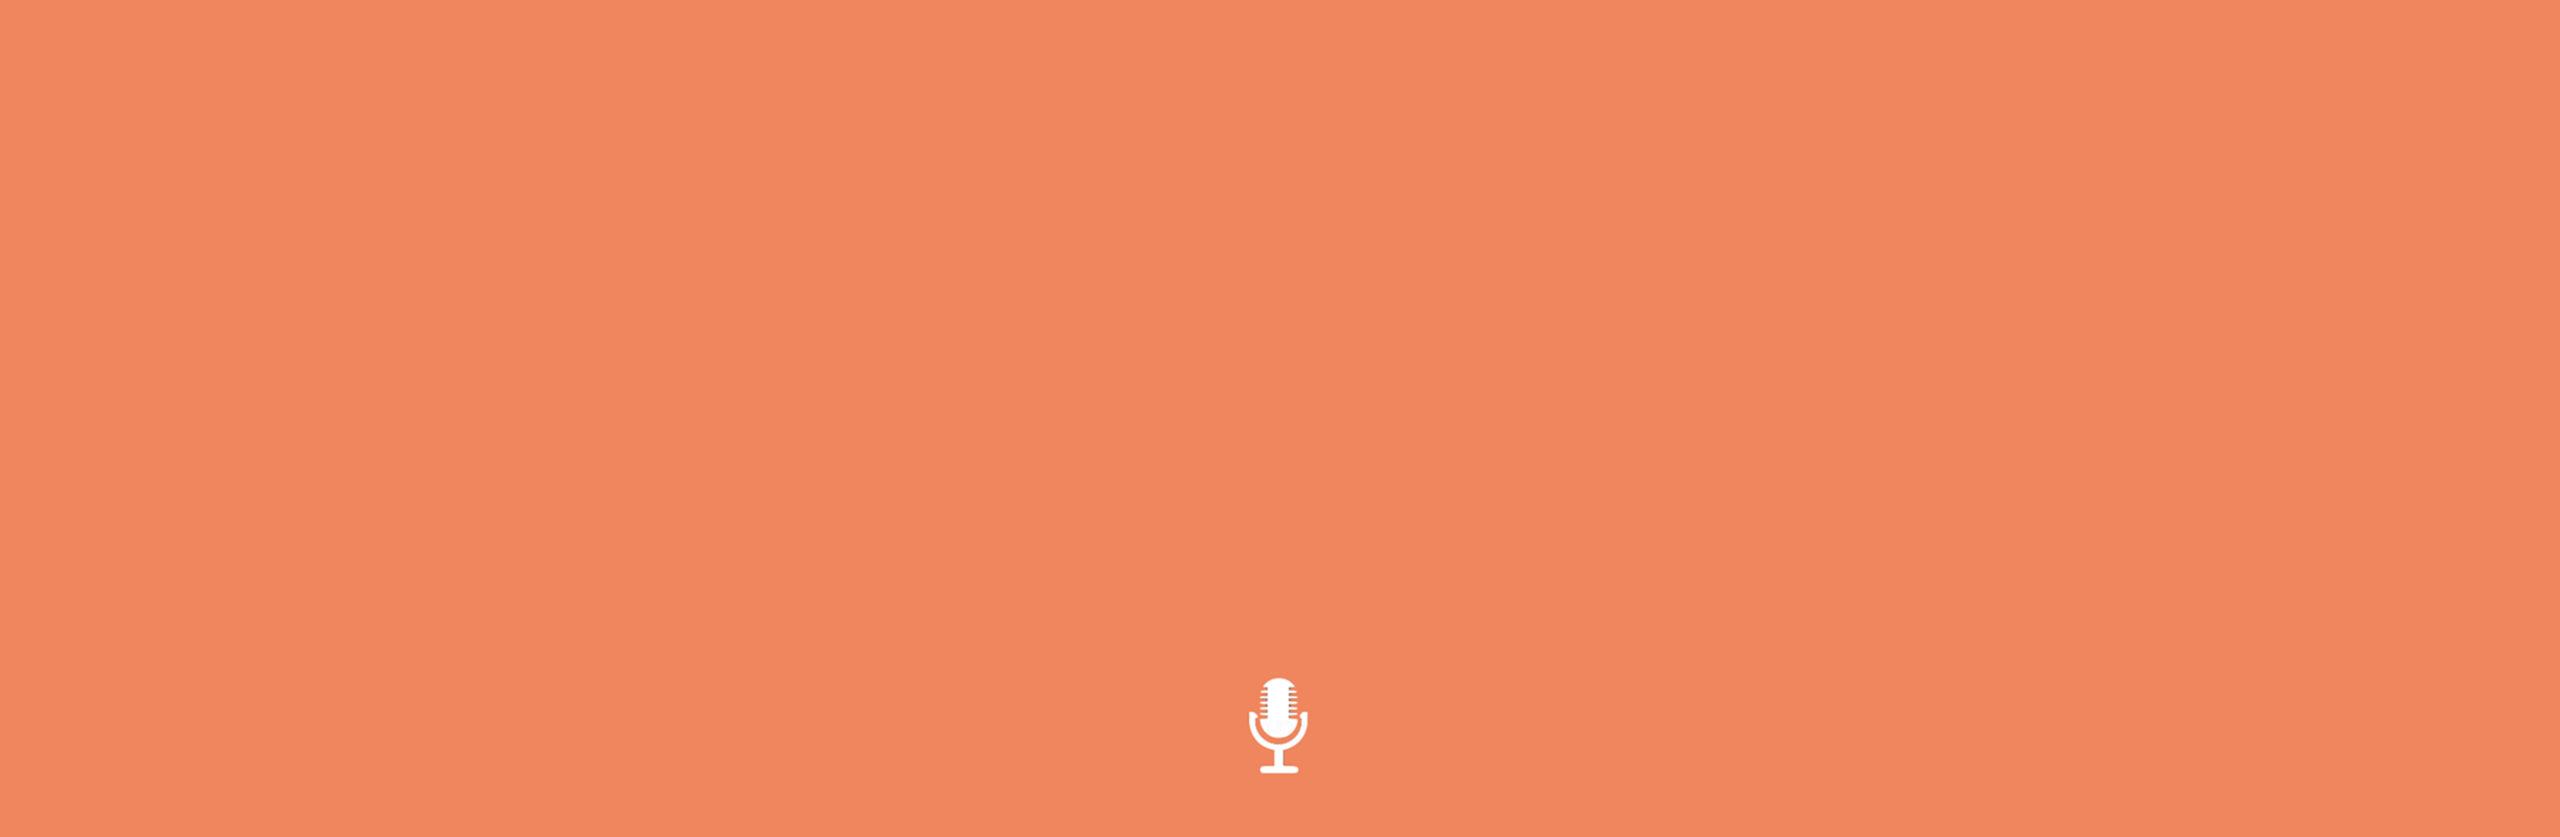 Progeny CEO, Neil Moles, speaks on Real Money Stories podcast